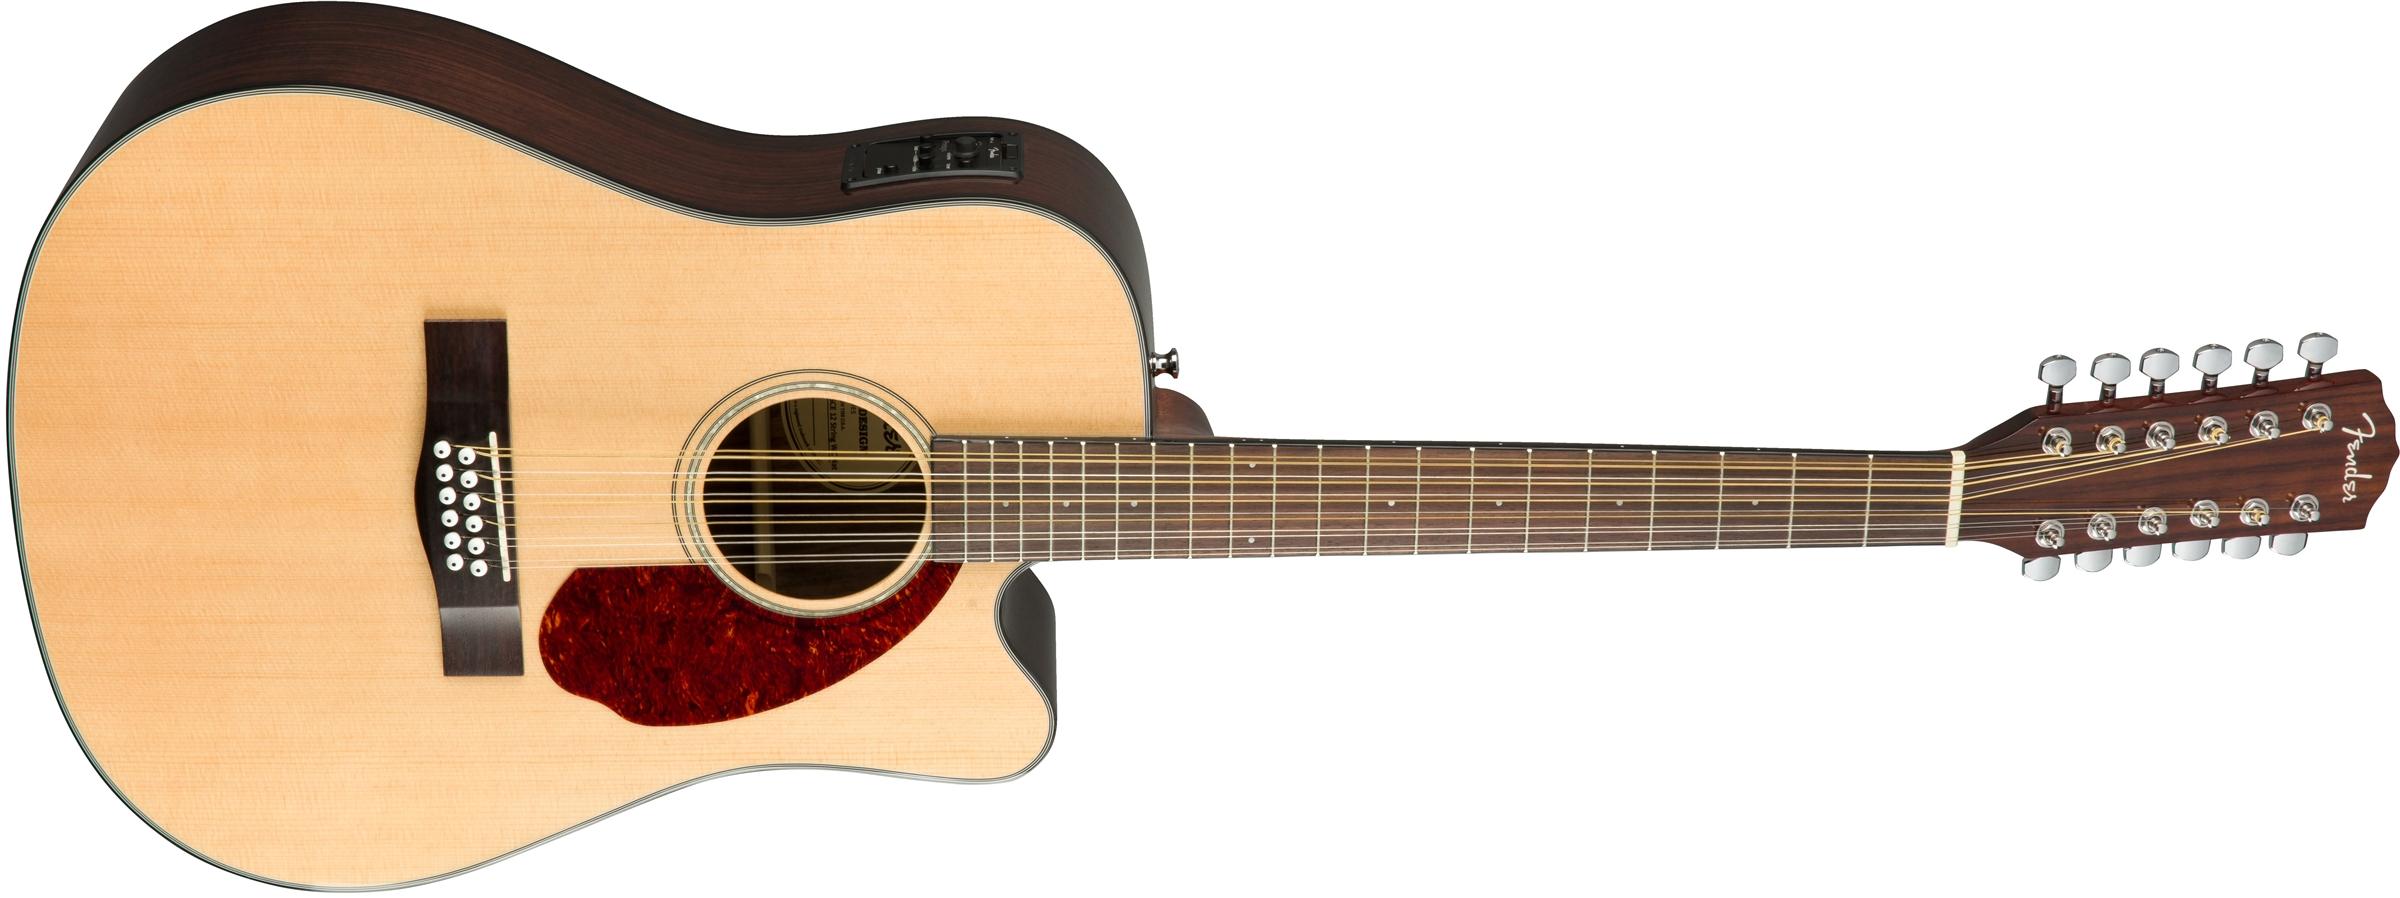 8e4521fbee2 CD-140SCE 12-String | Acoustic Guitars